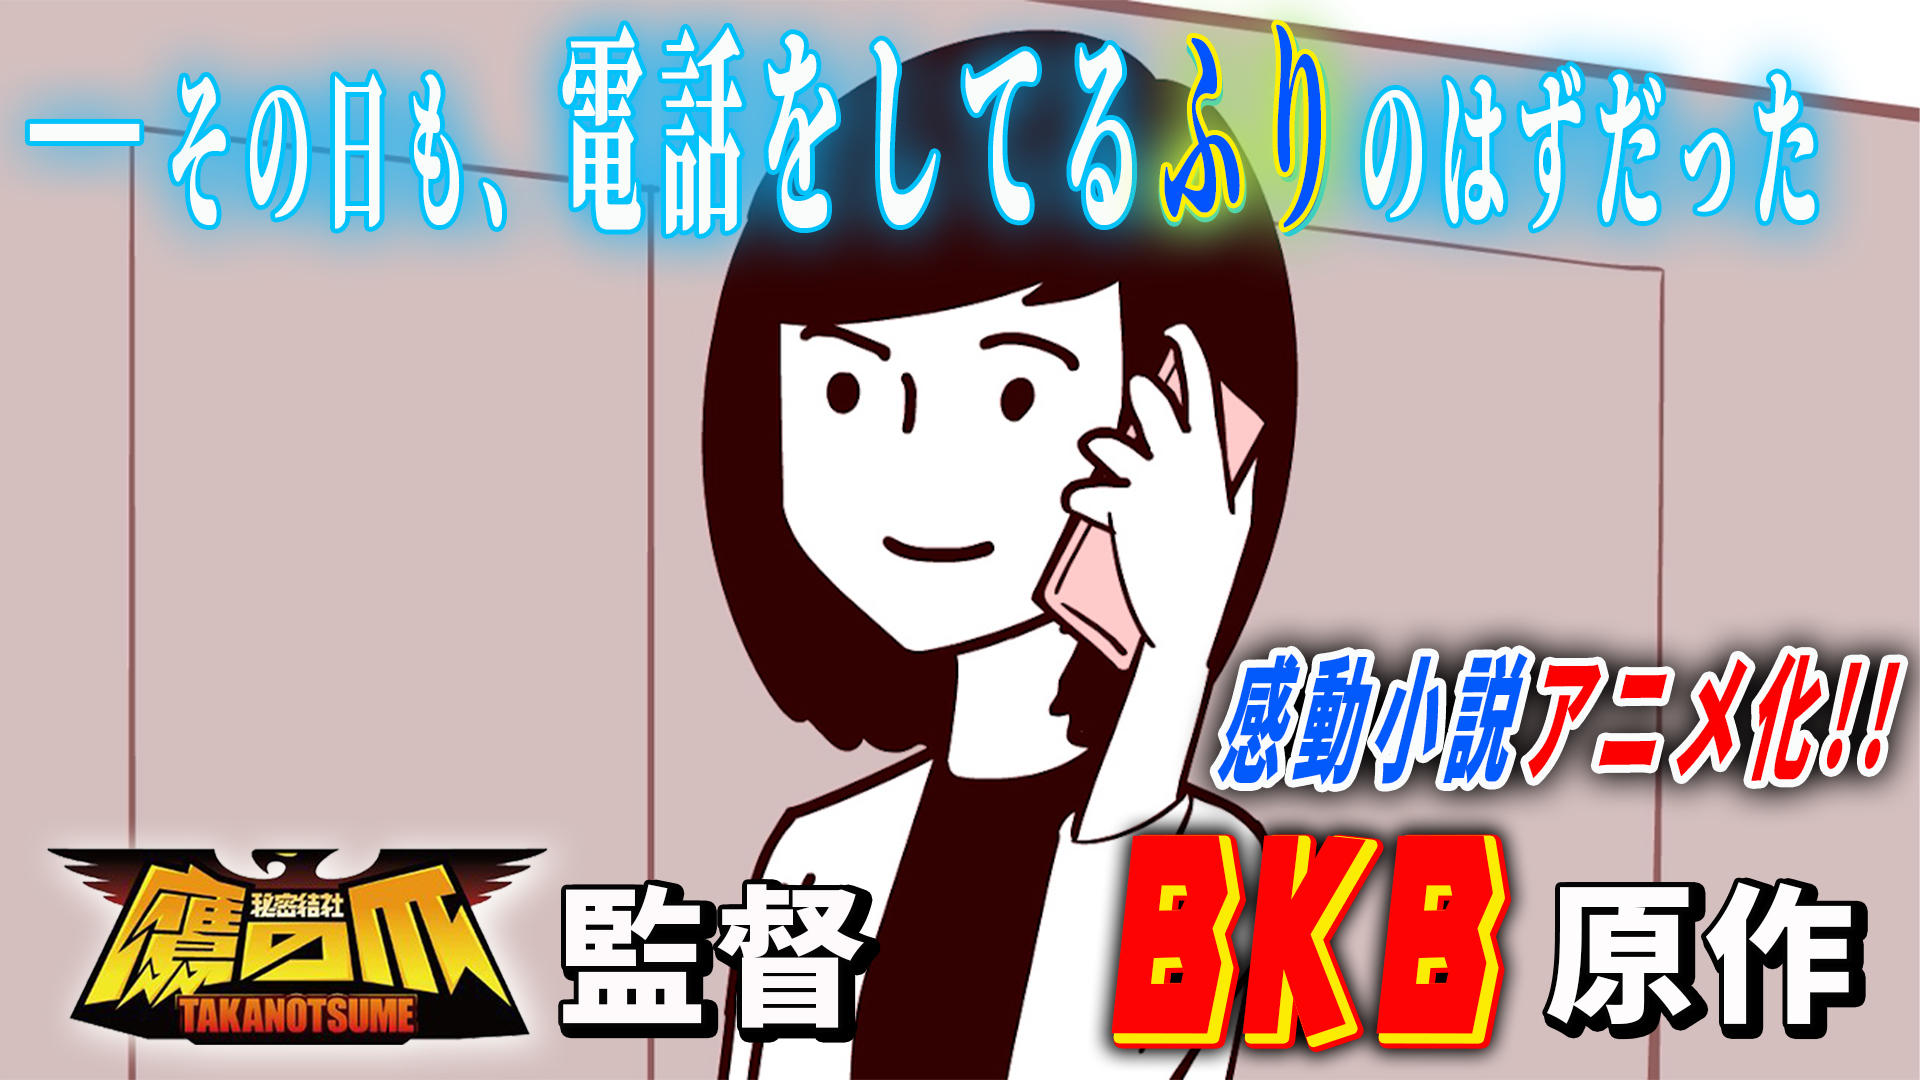 BKBによる話題の超短編集「電話をしてるふり」大ヒット記念 FROGMAN制作のコラボアニメが公開!